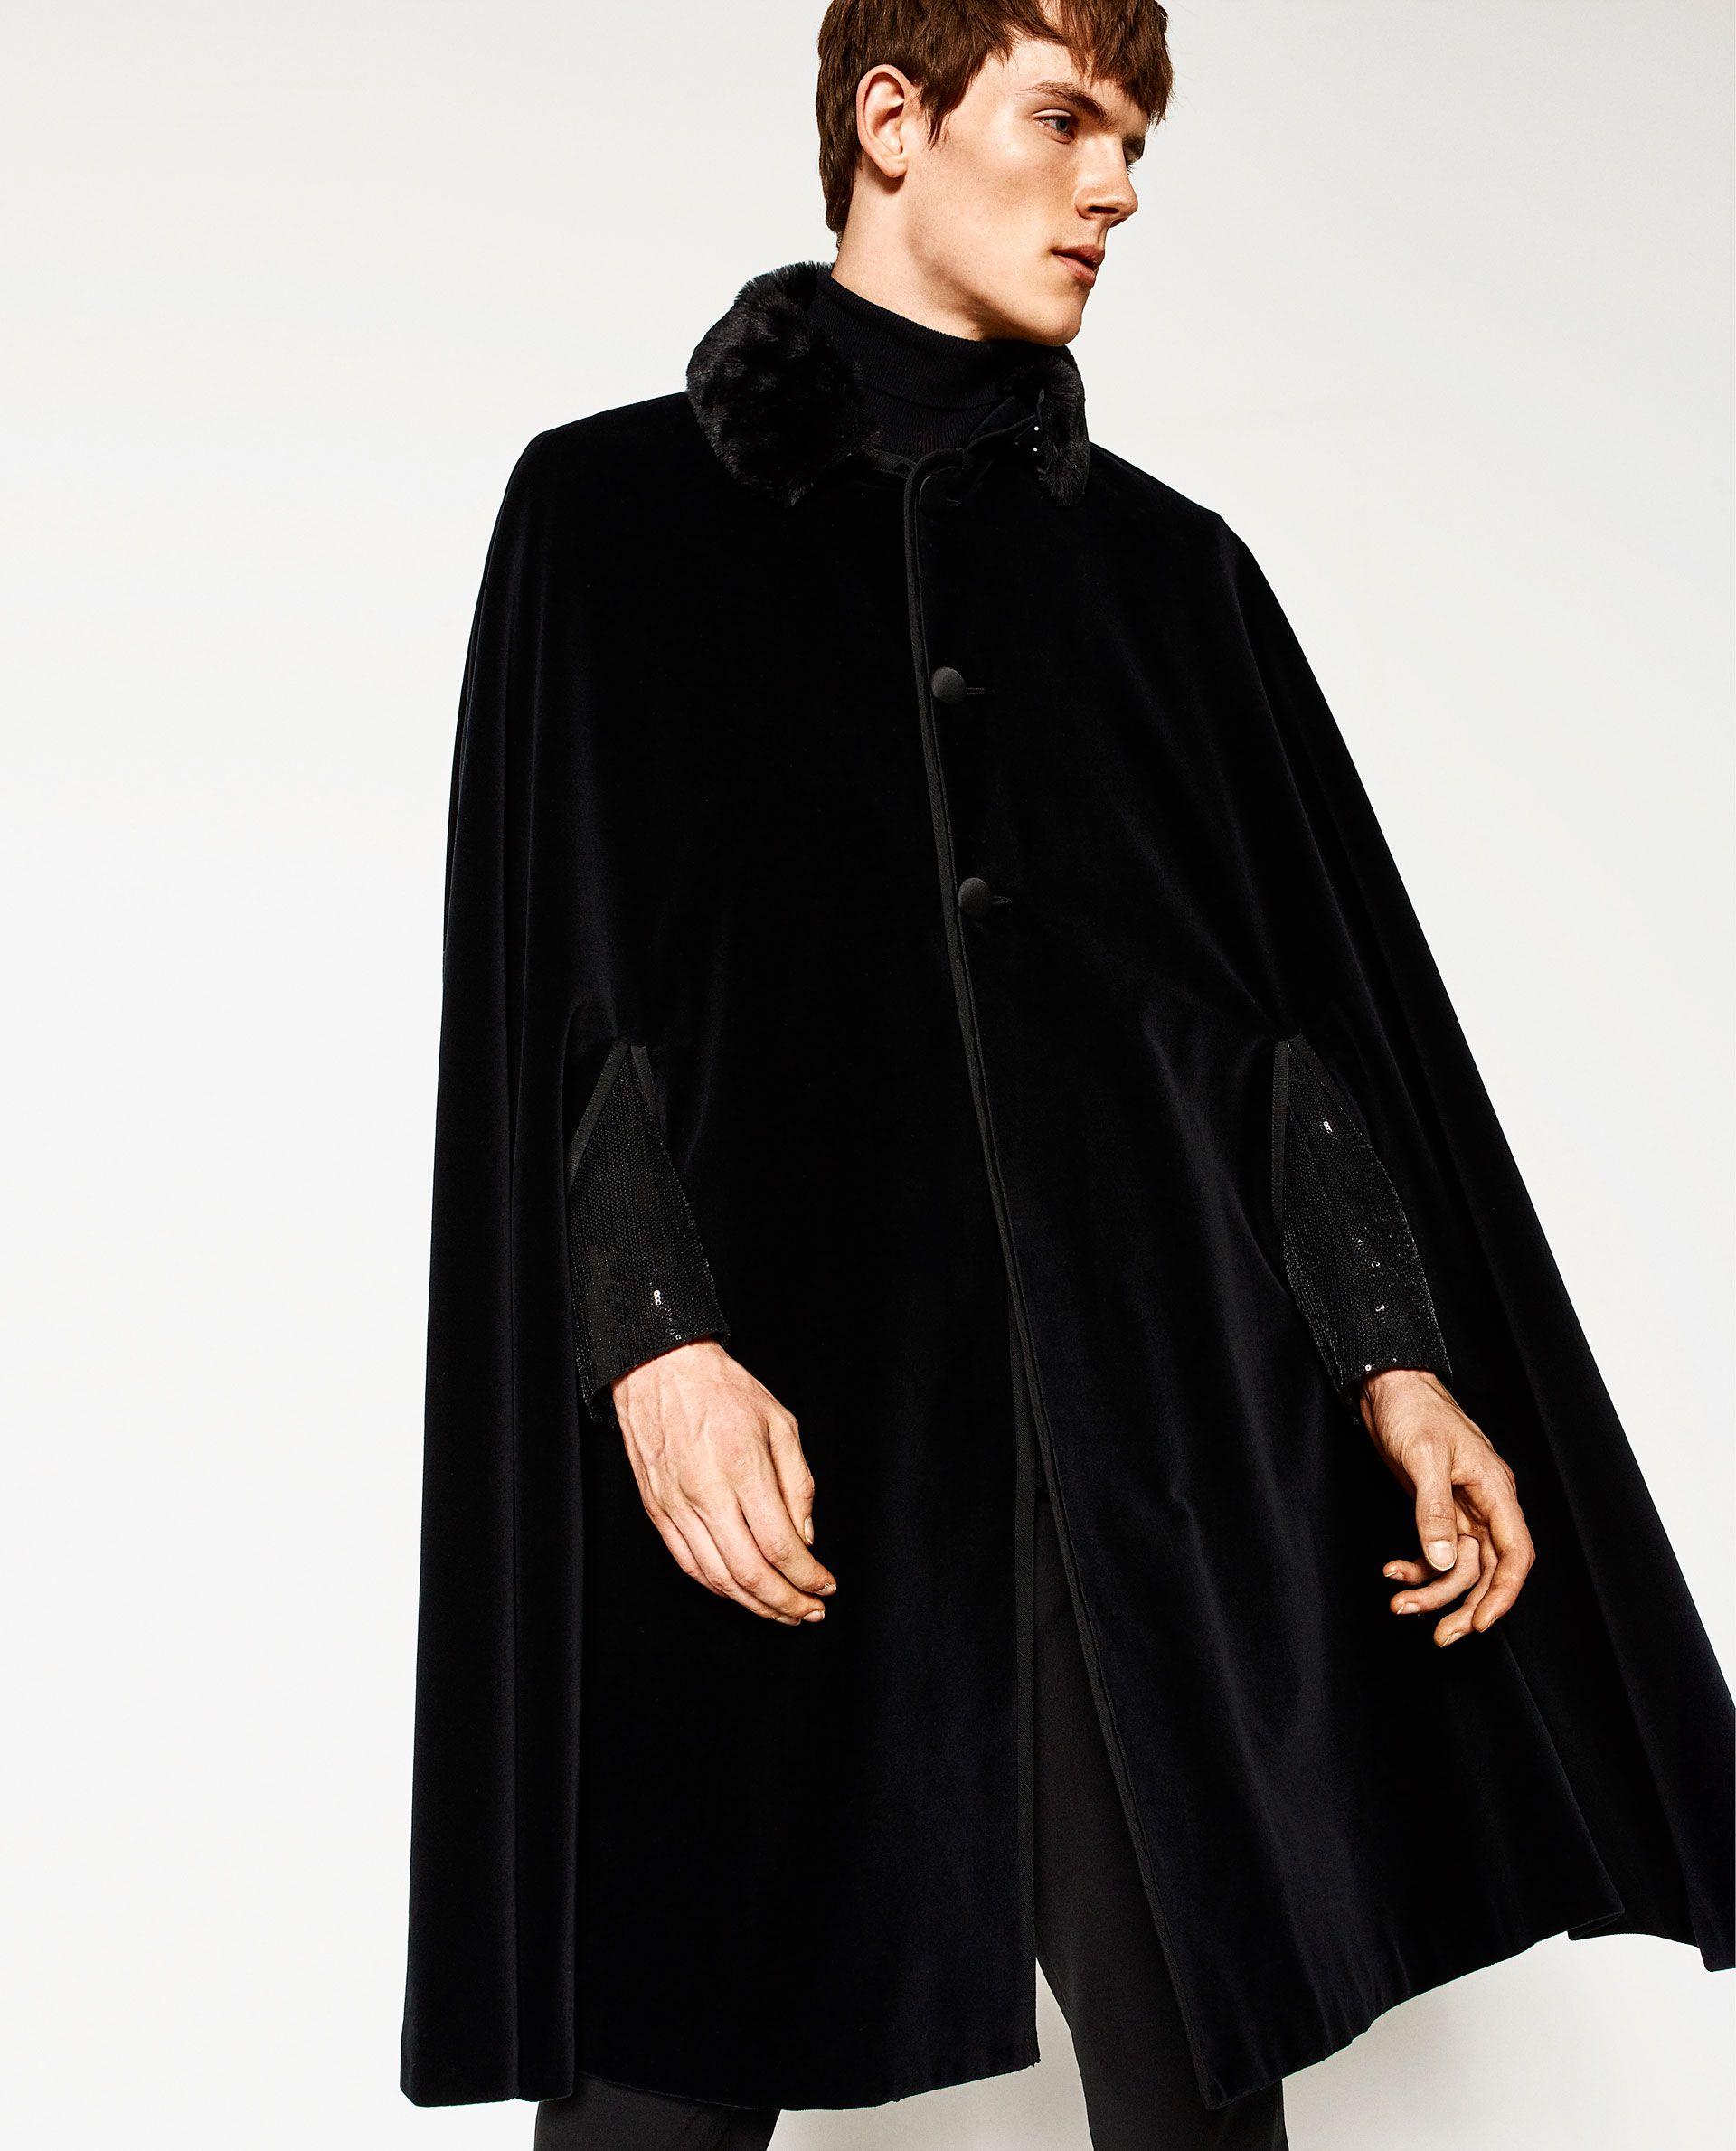 Velvet Cape From Zara Stile Fur Manner Manner Outfit Kostumvorschlage